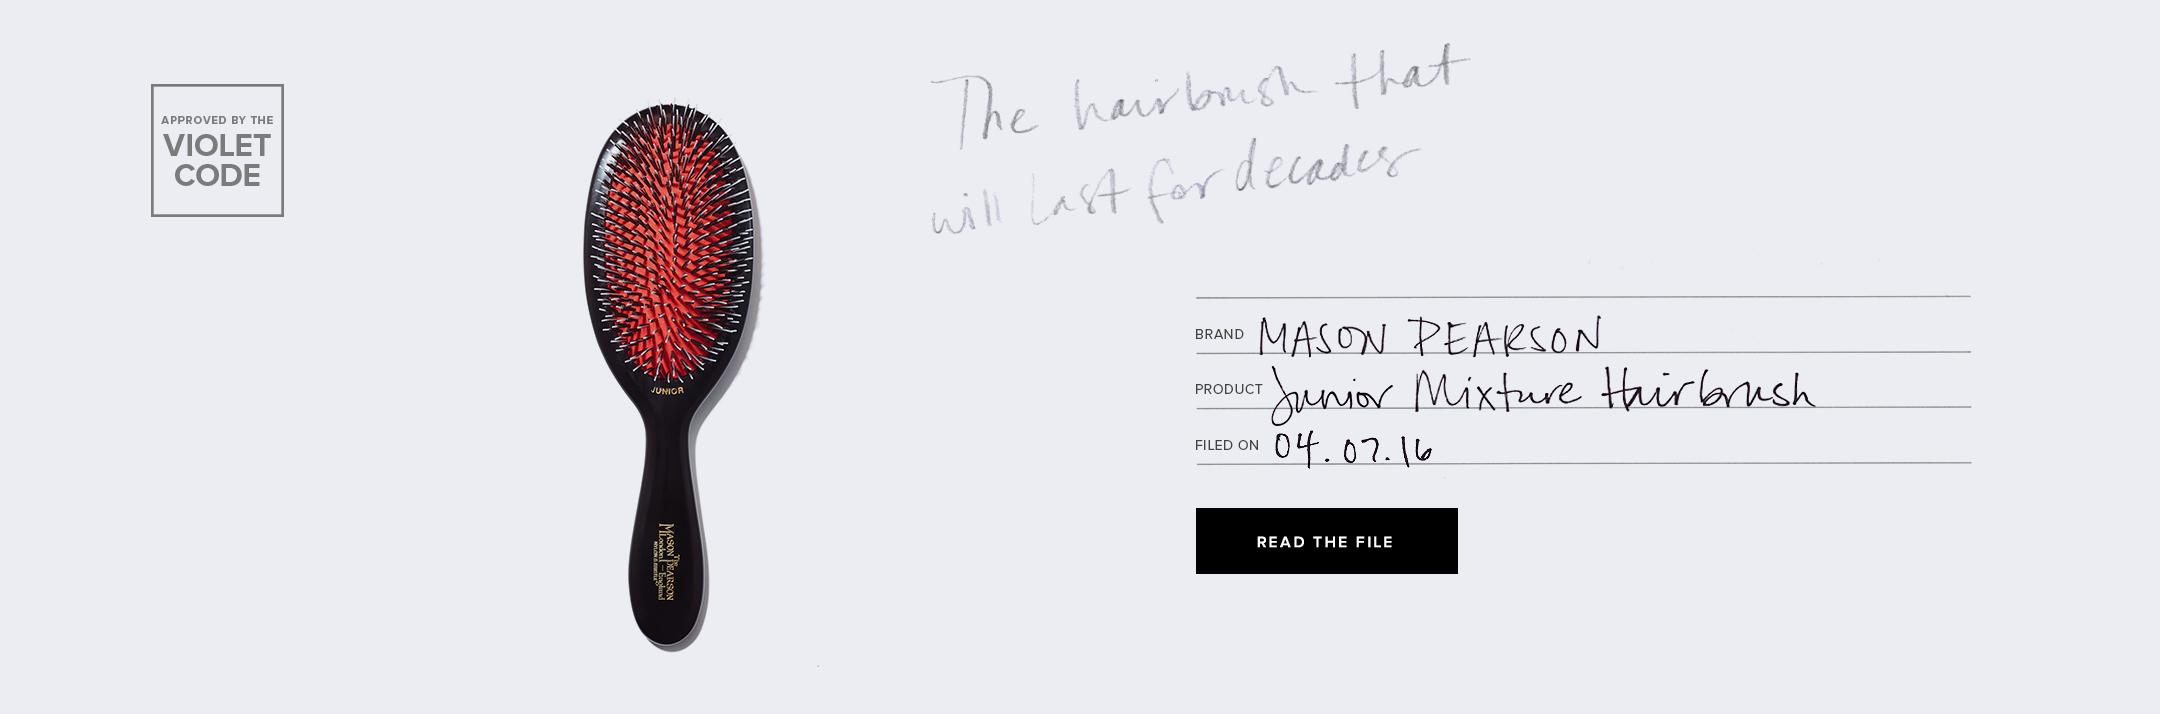 mason-pearson-junior-mixture-nylon-and-boar-bristle-hair-brush-interstitial-darkBG.jpg